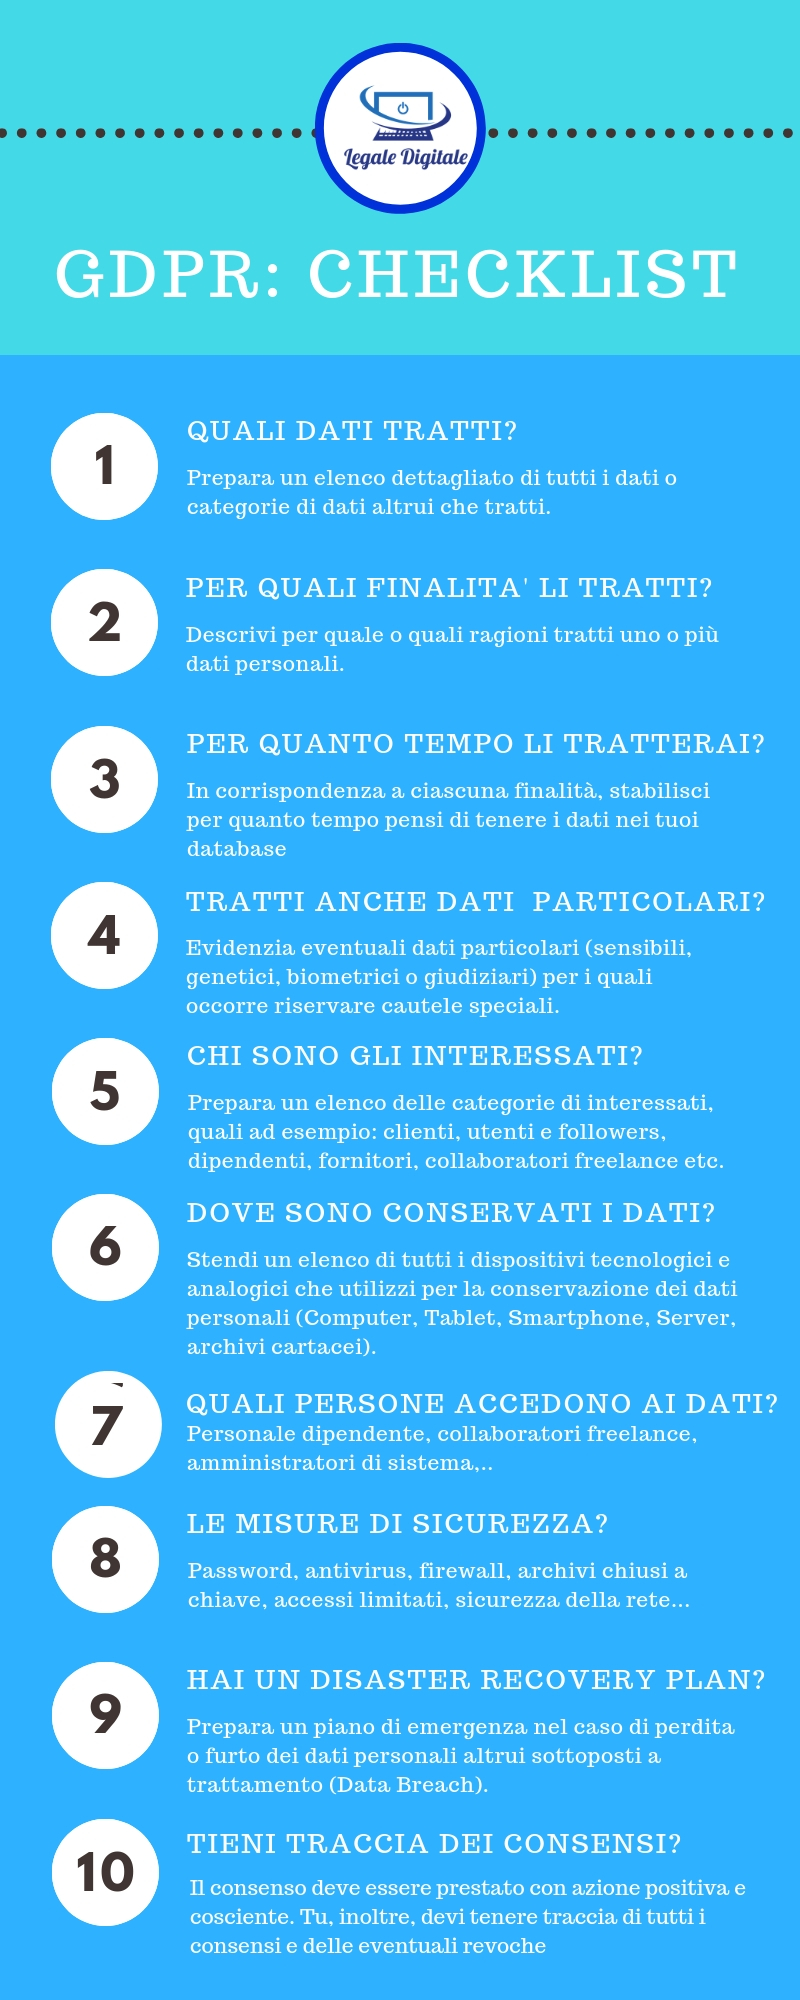 gdpr_ checklist.jpg